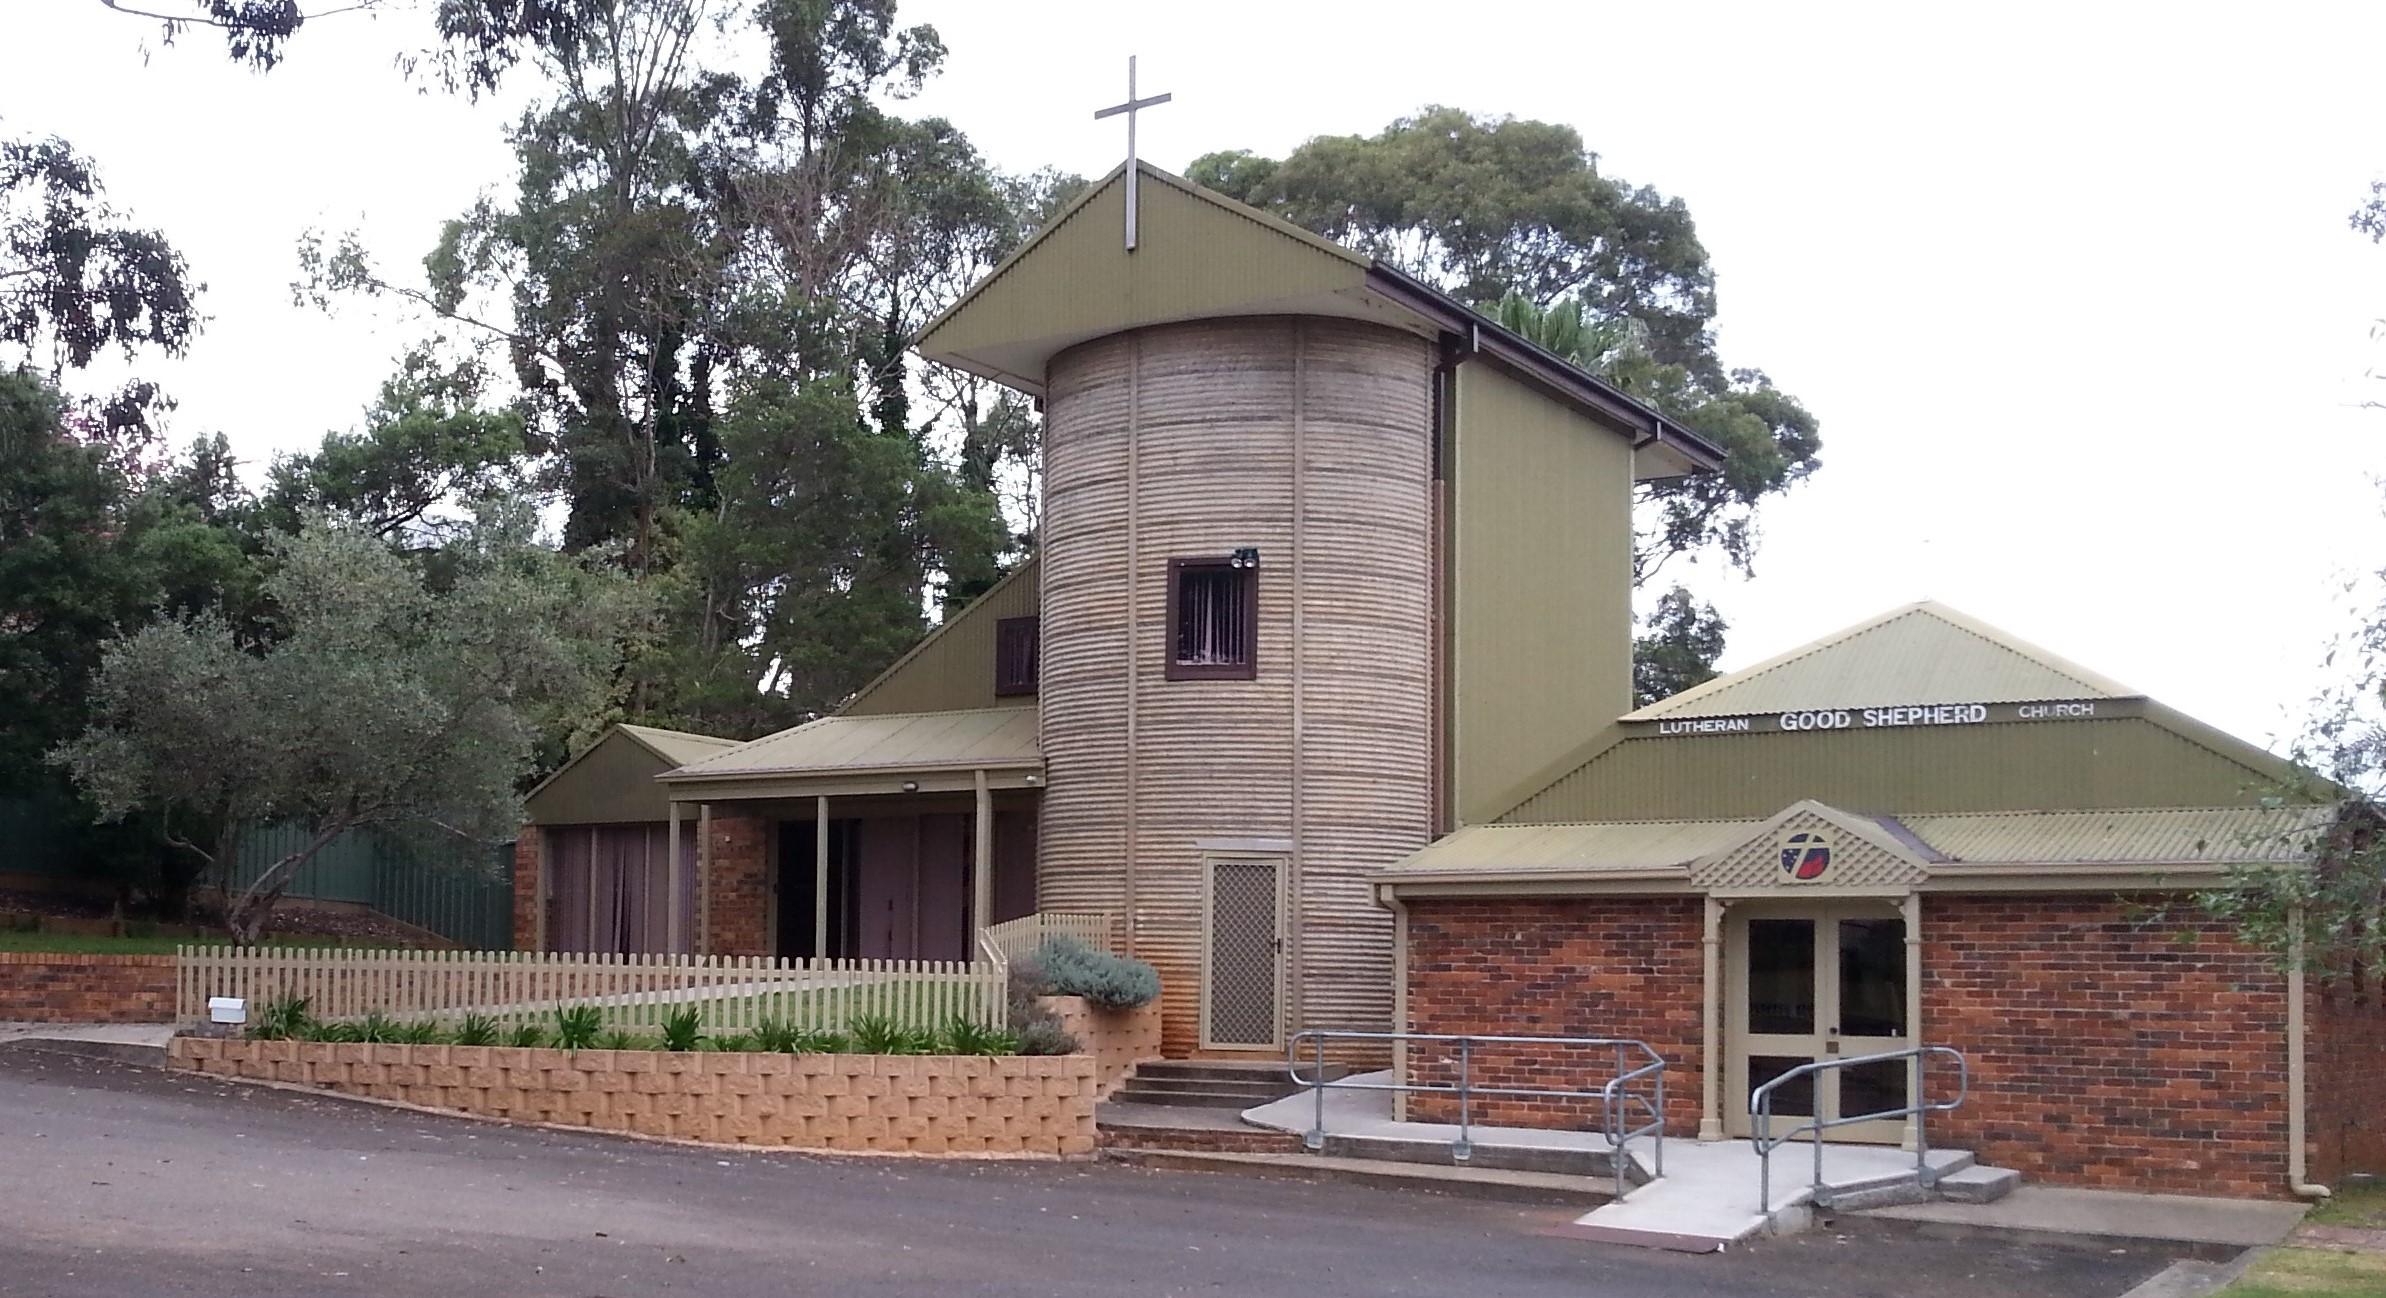 Silo Church